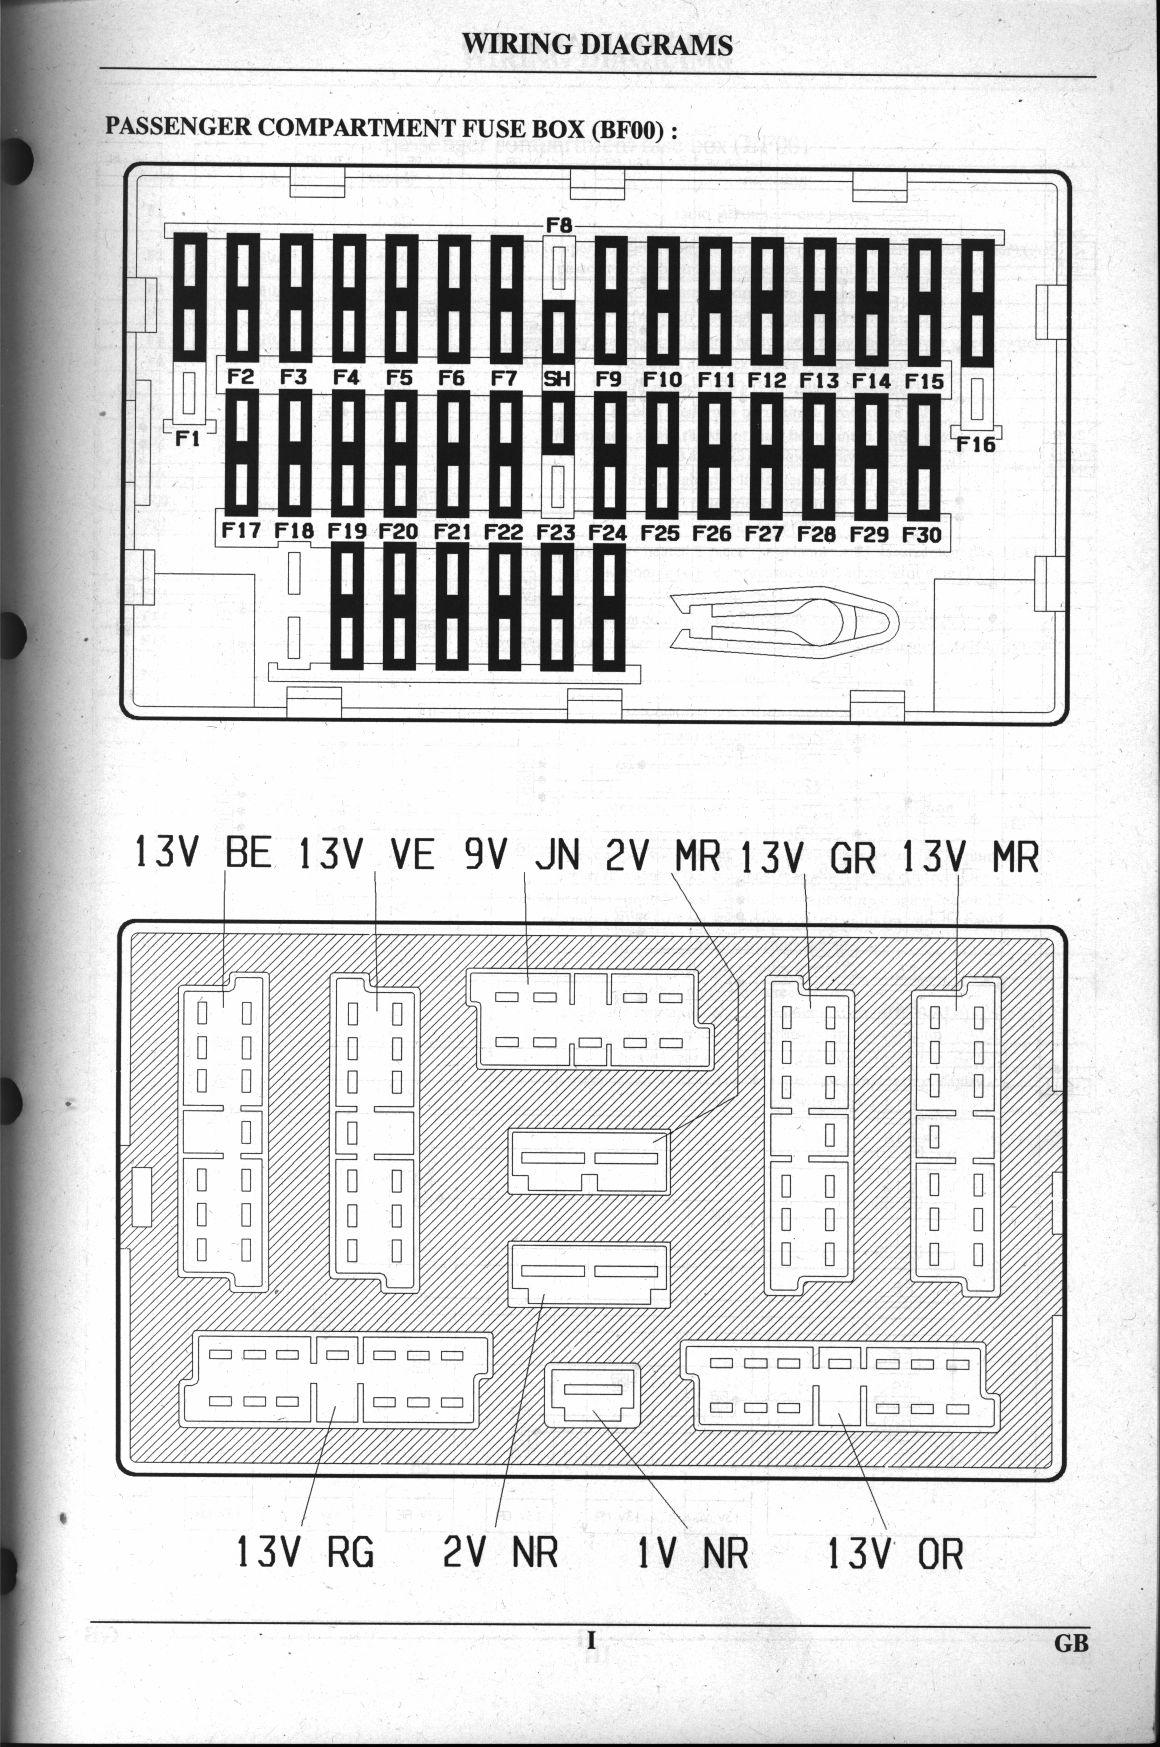 citroen berlingo 2005 fuse box diagram 38 wiring diagram